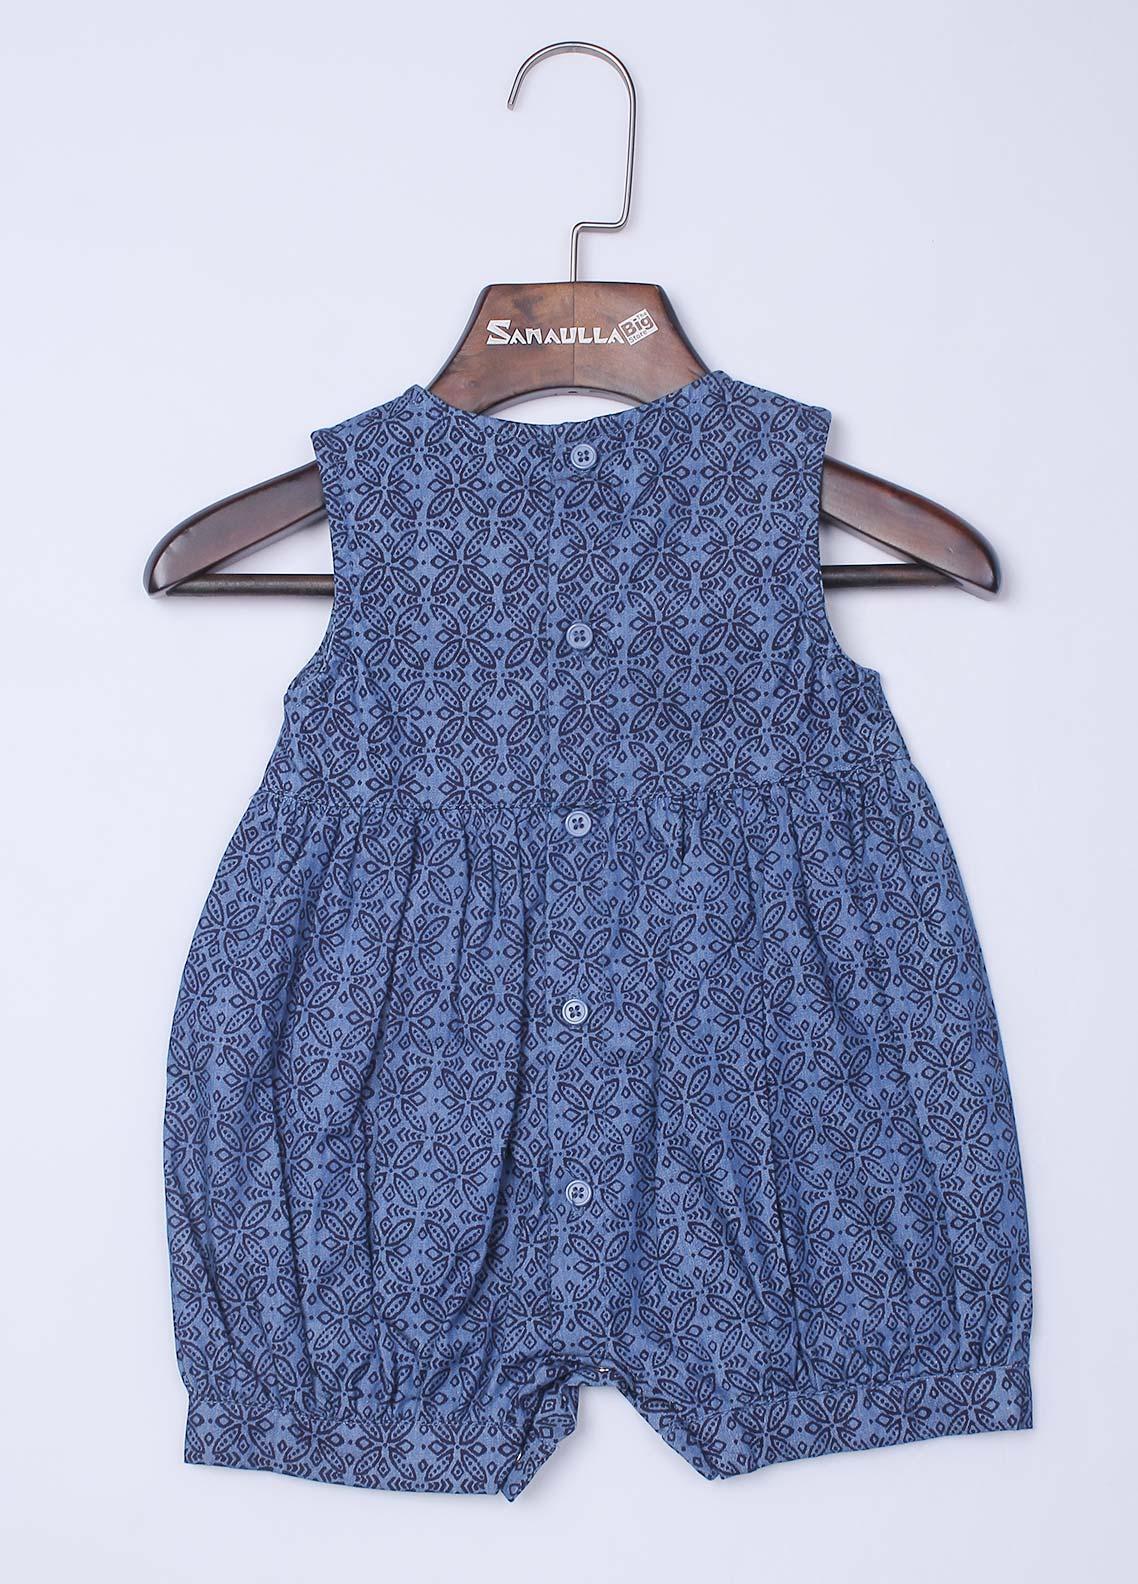 Sanaulla Exclusive Range Cotton Frock Style 1 Piece Suit for Girls -  08 Dark Blue